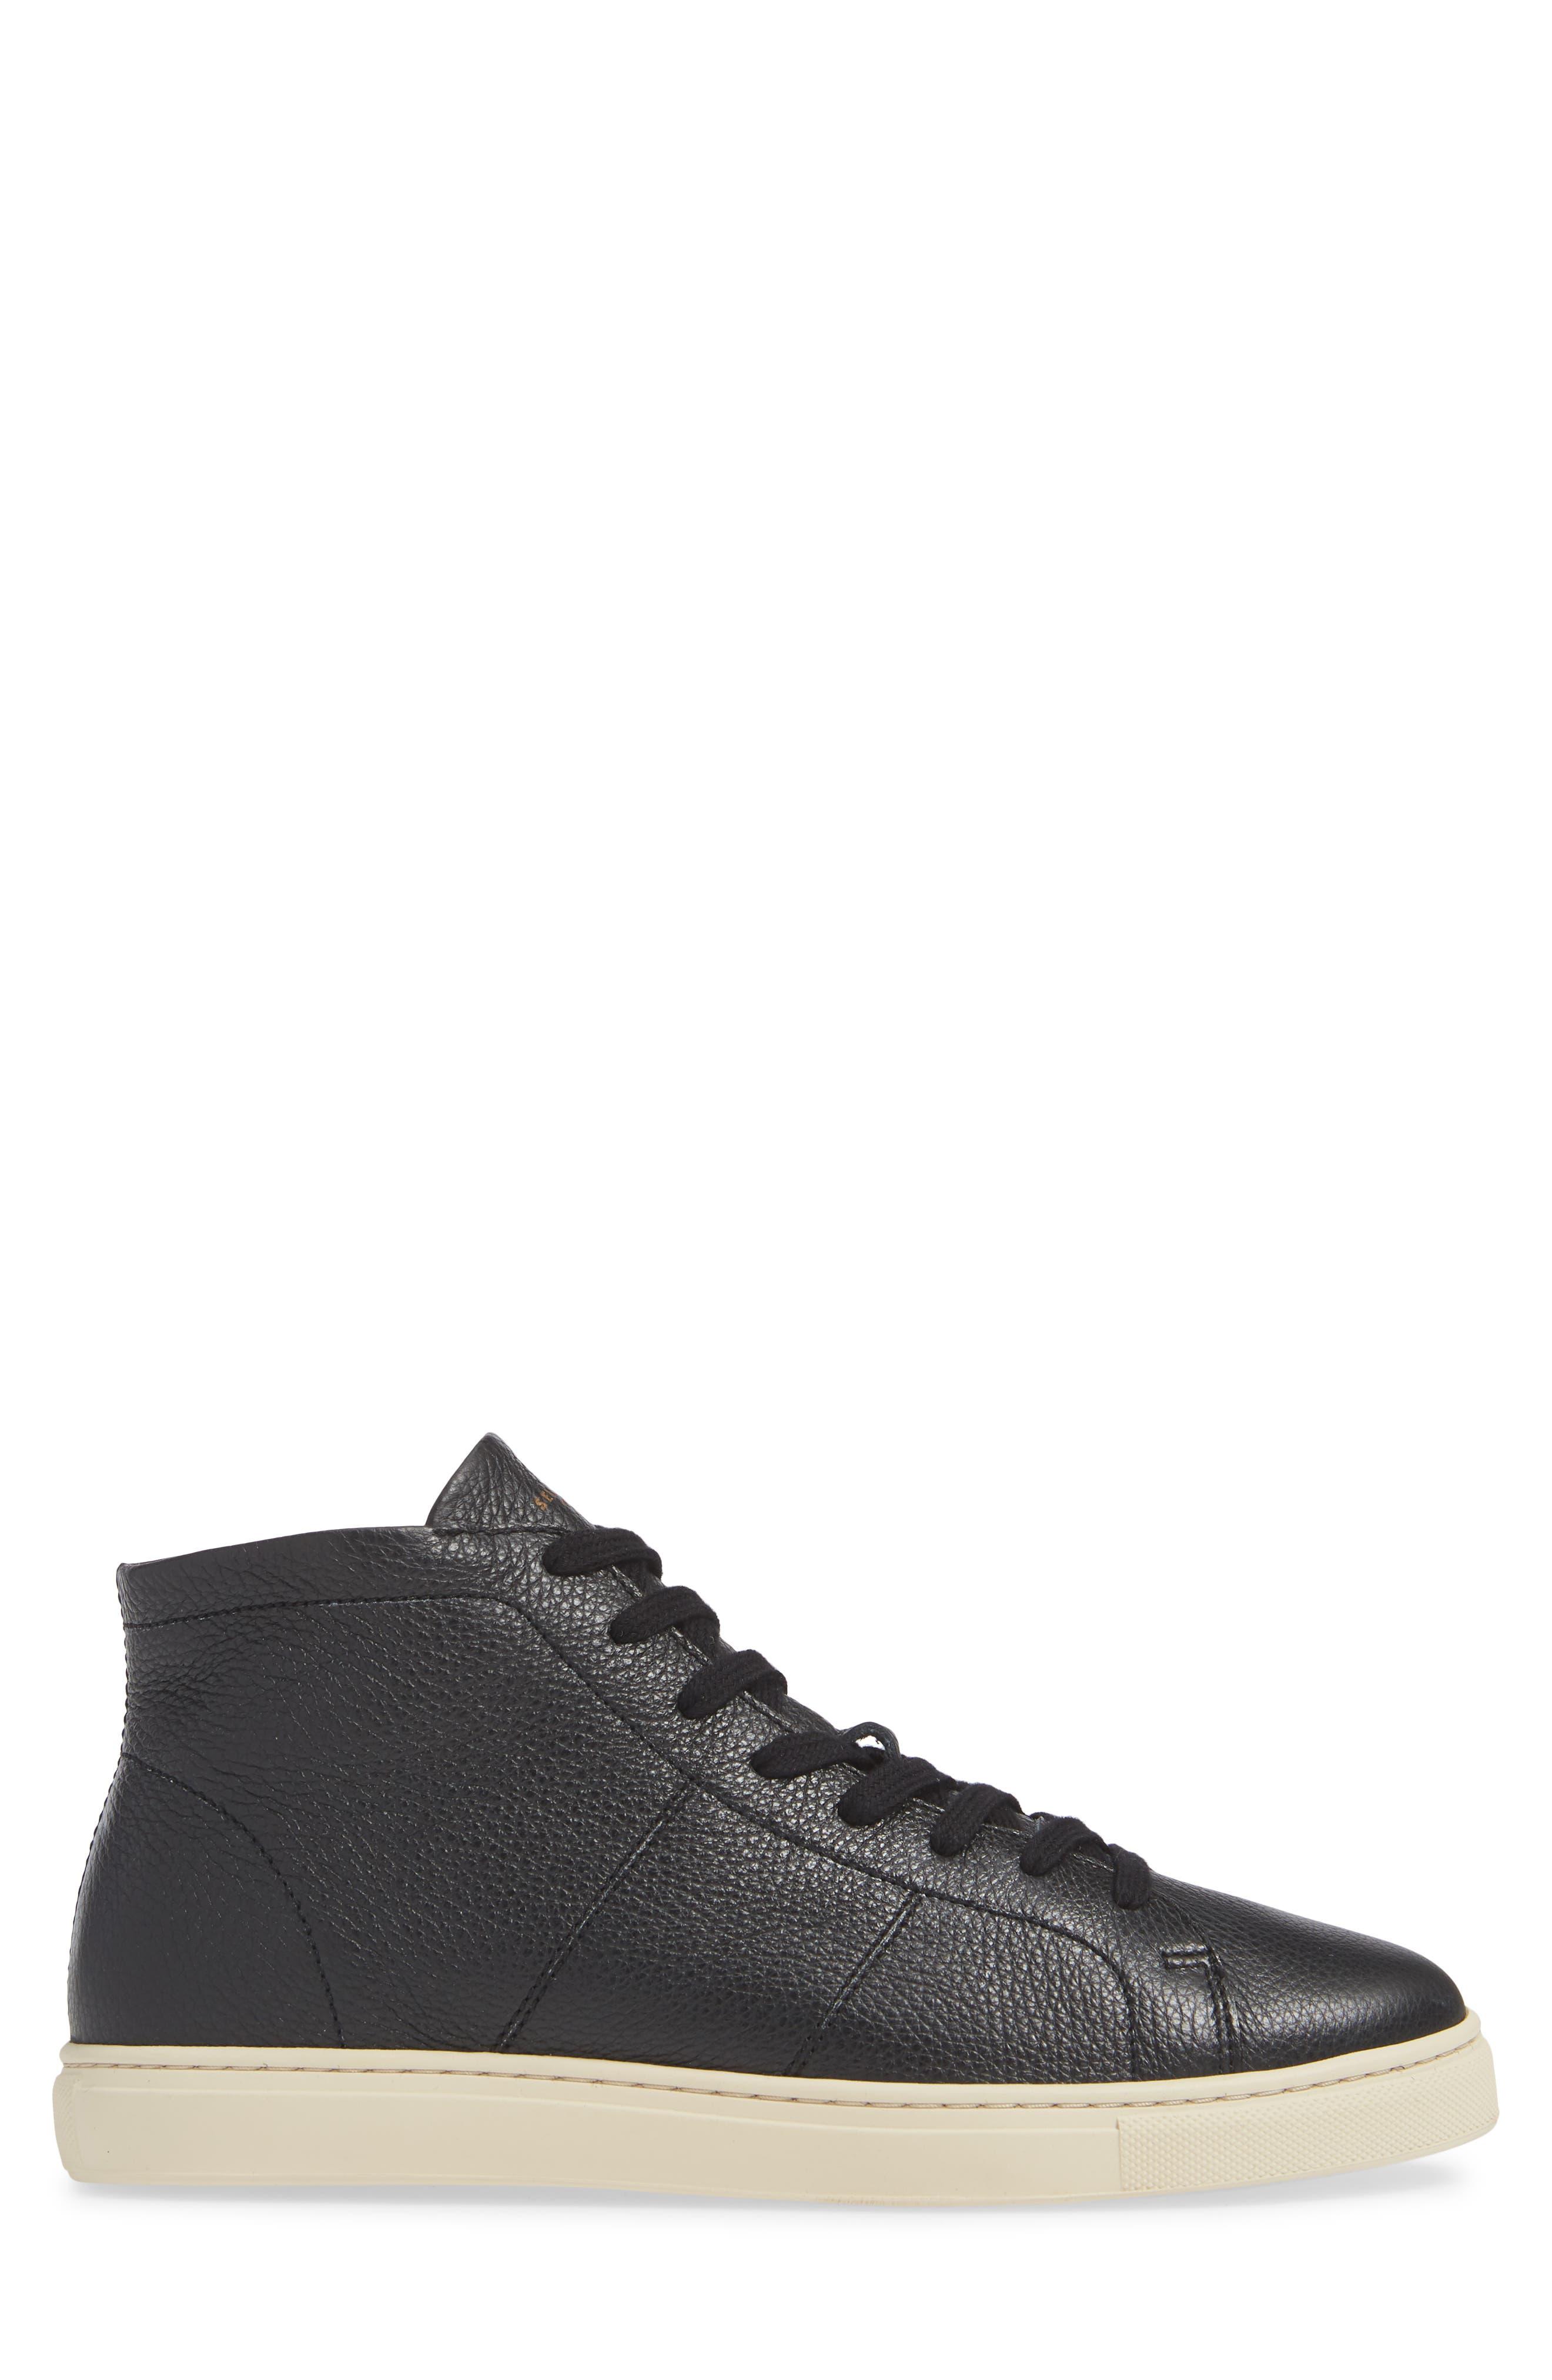 David Sneaker,                             Alternate thumbnail 3, color,                             BLACK